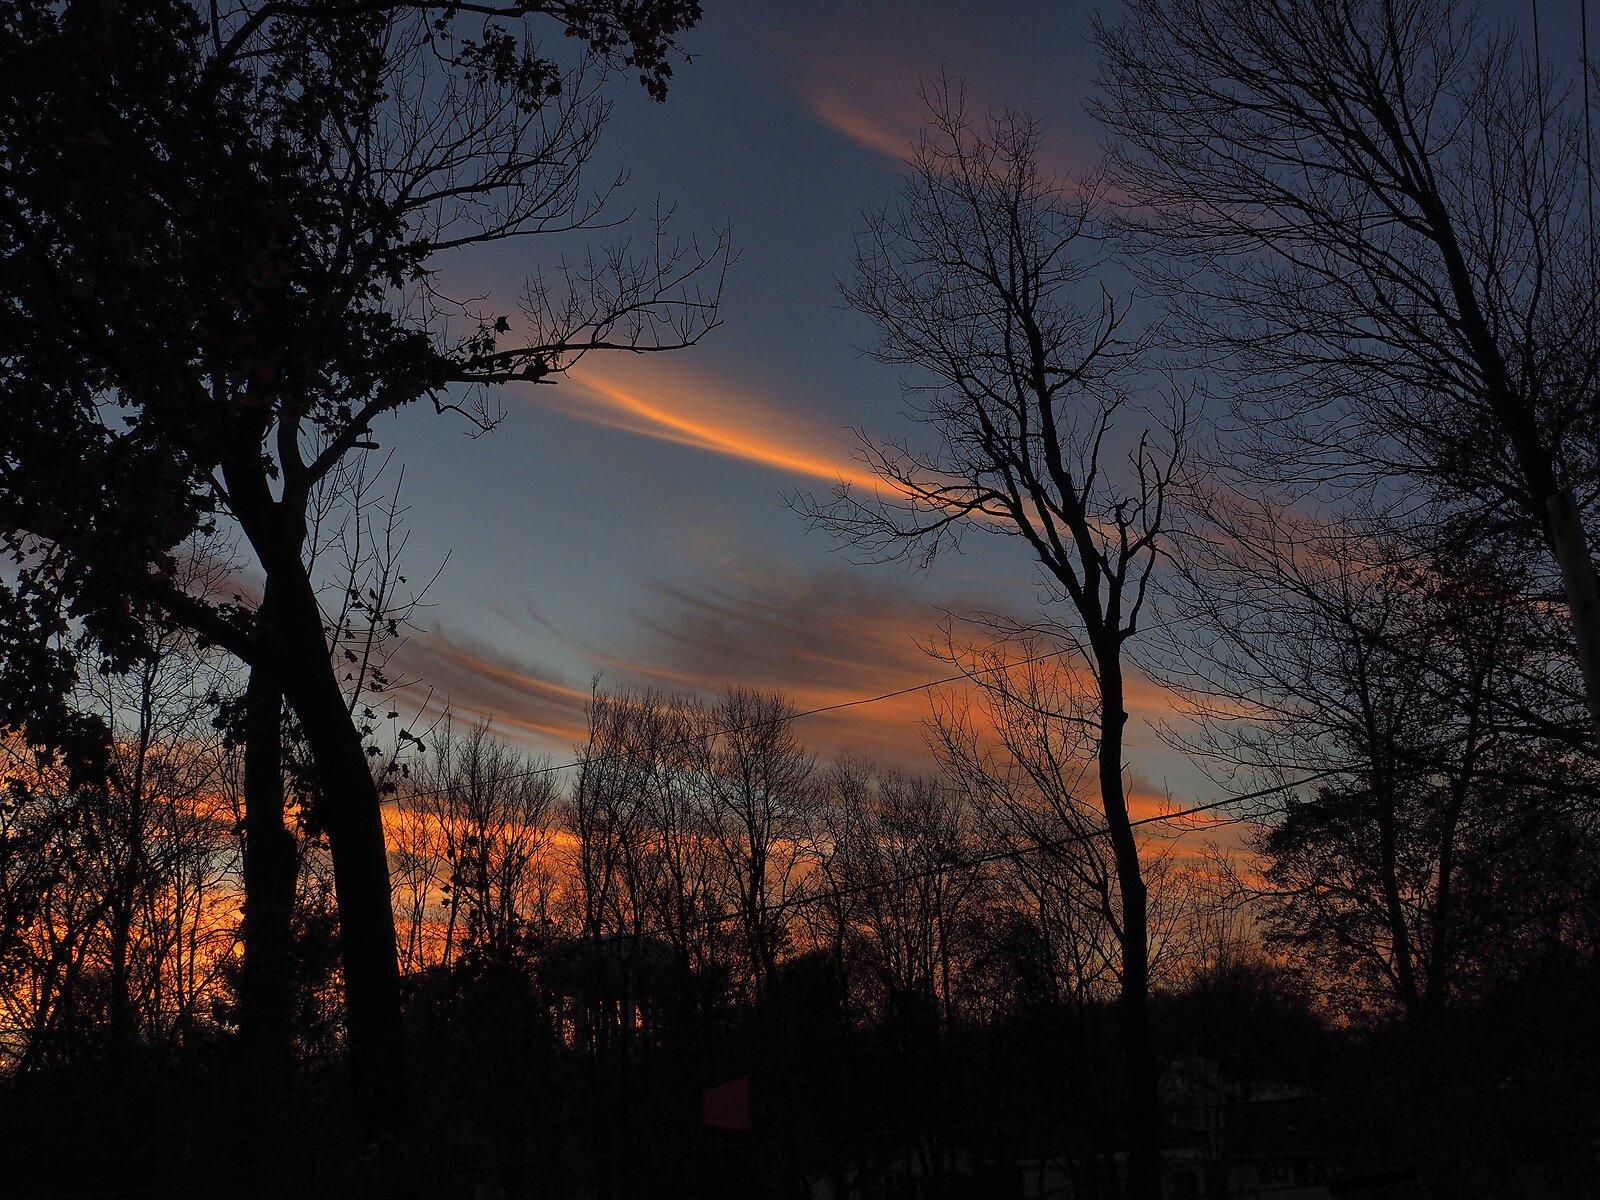 M1 gorgious sunset 004 B.jpg